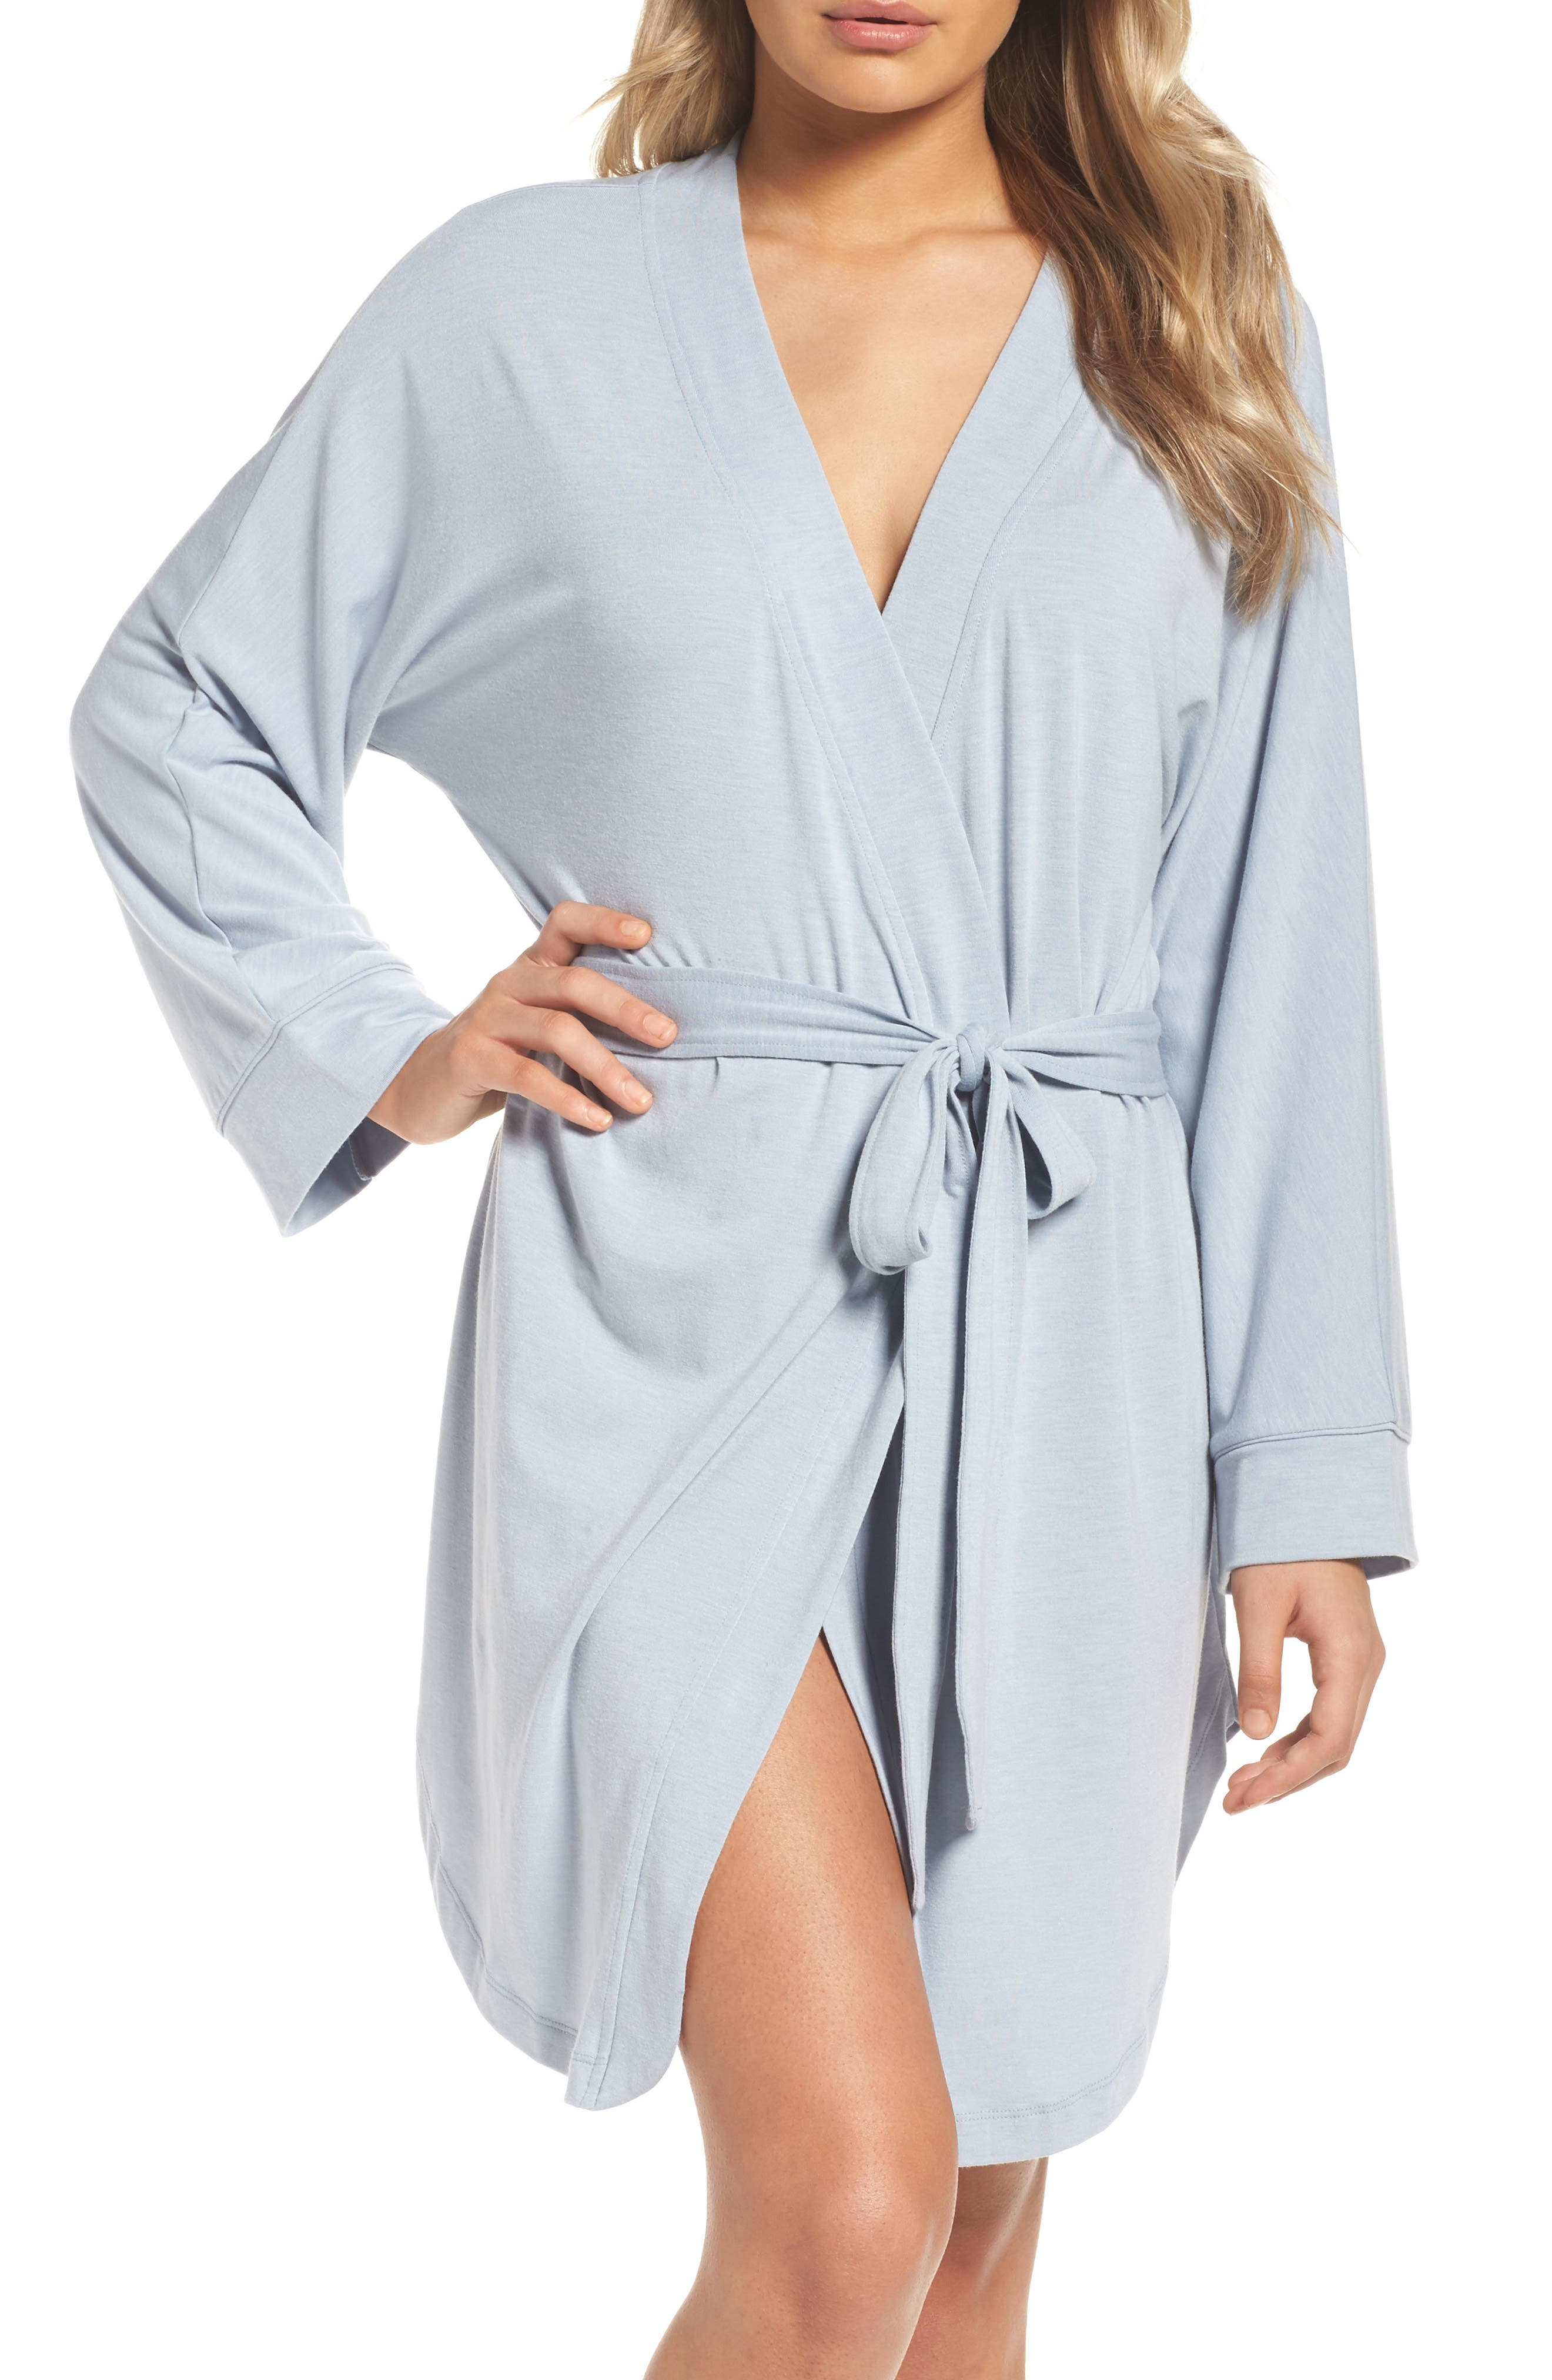 Honeydew Intimates Jersey Robe (2 for $60)